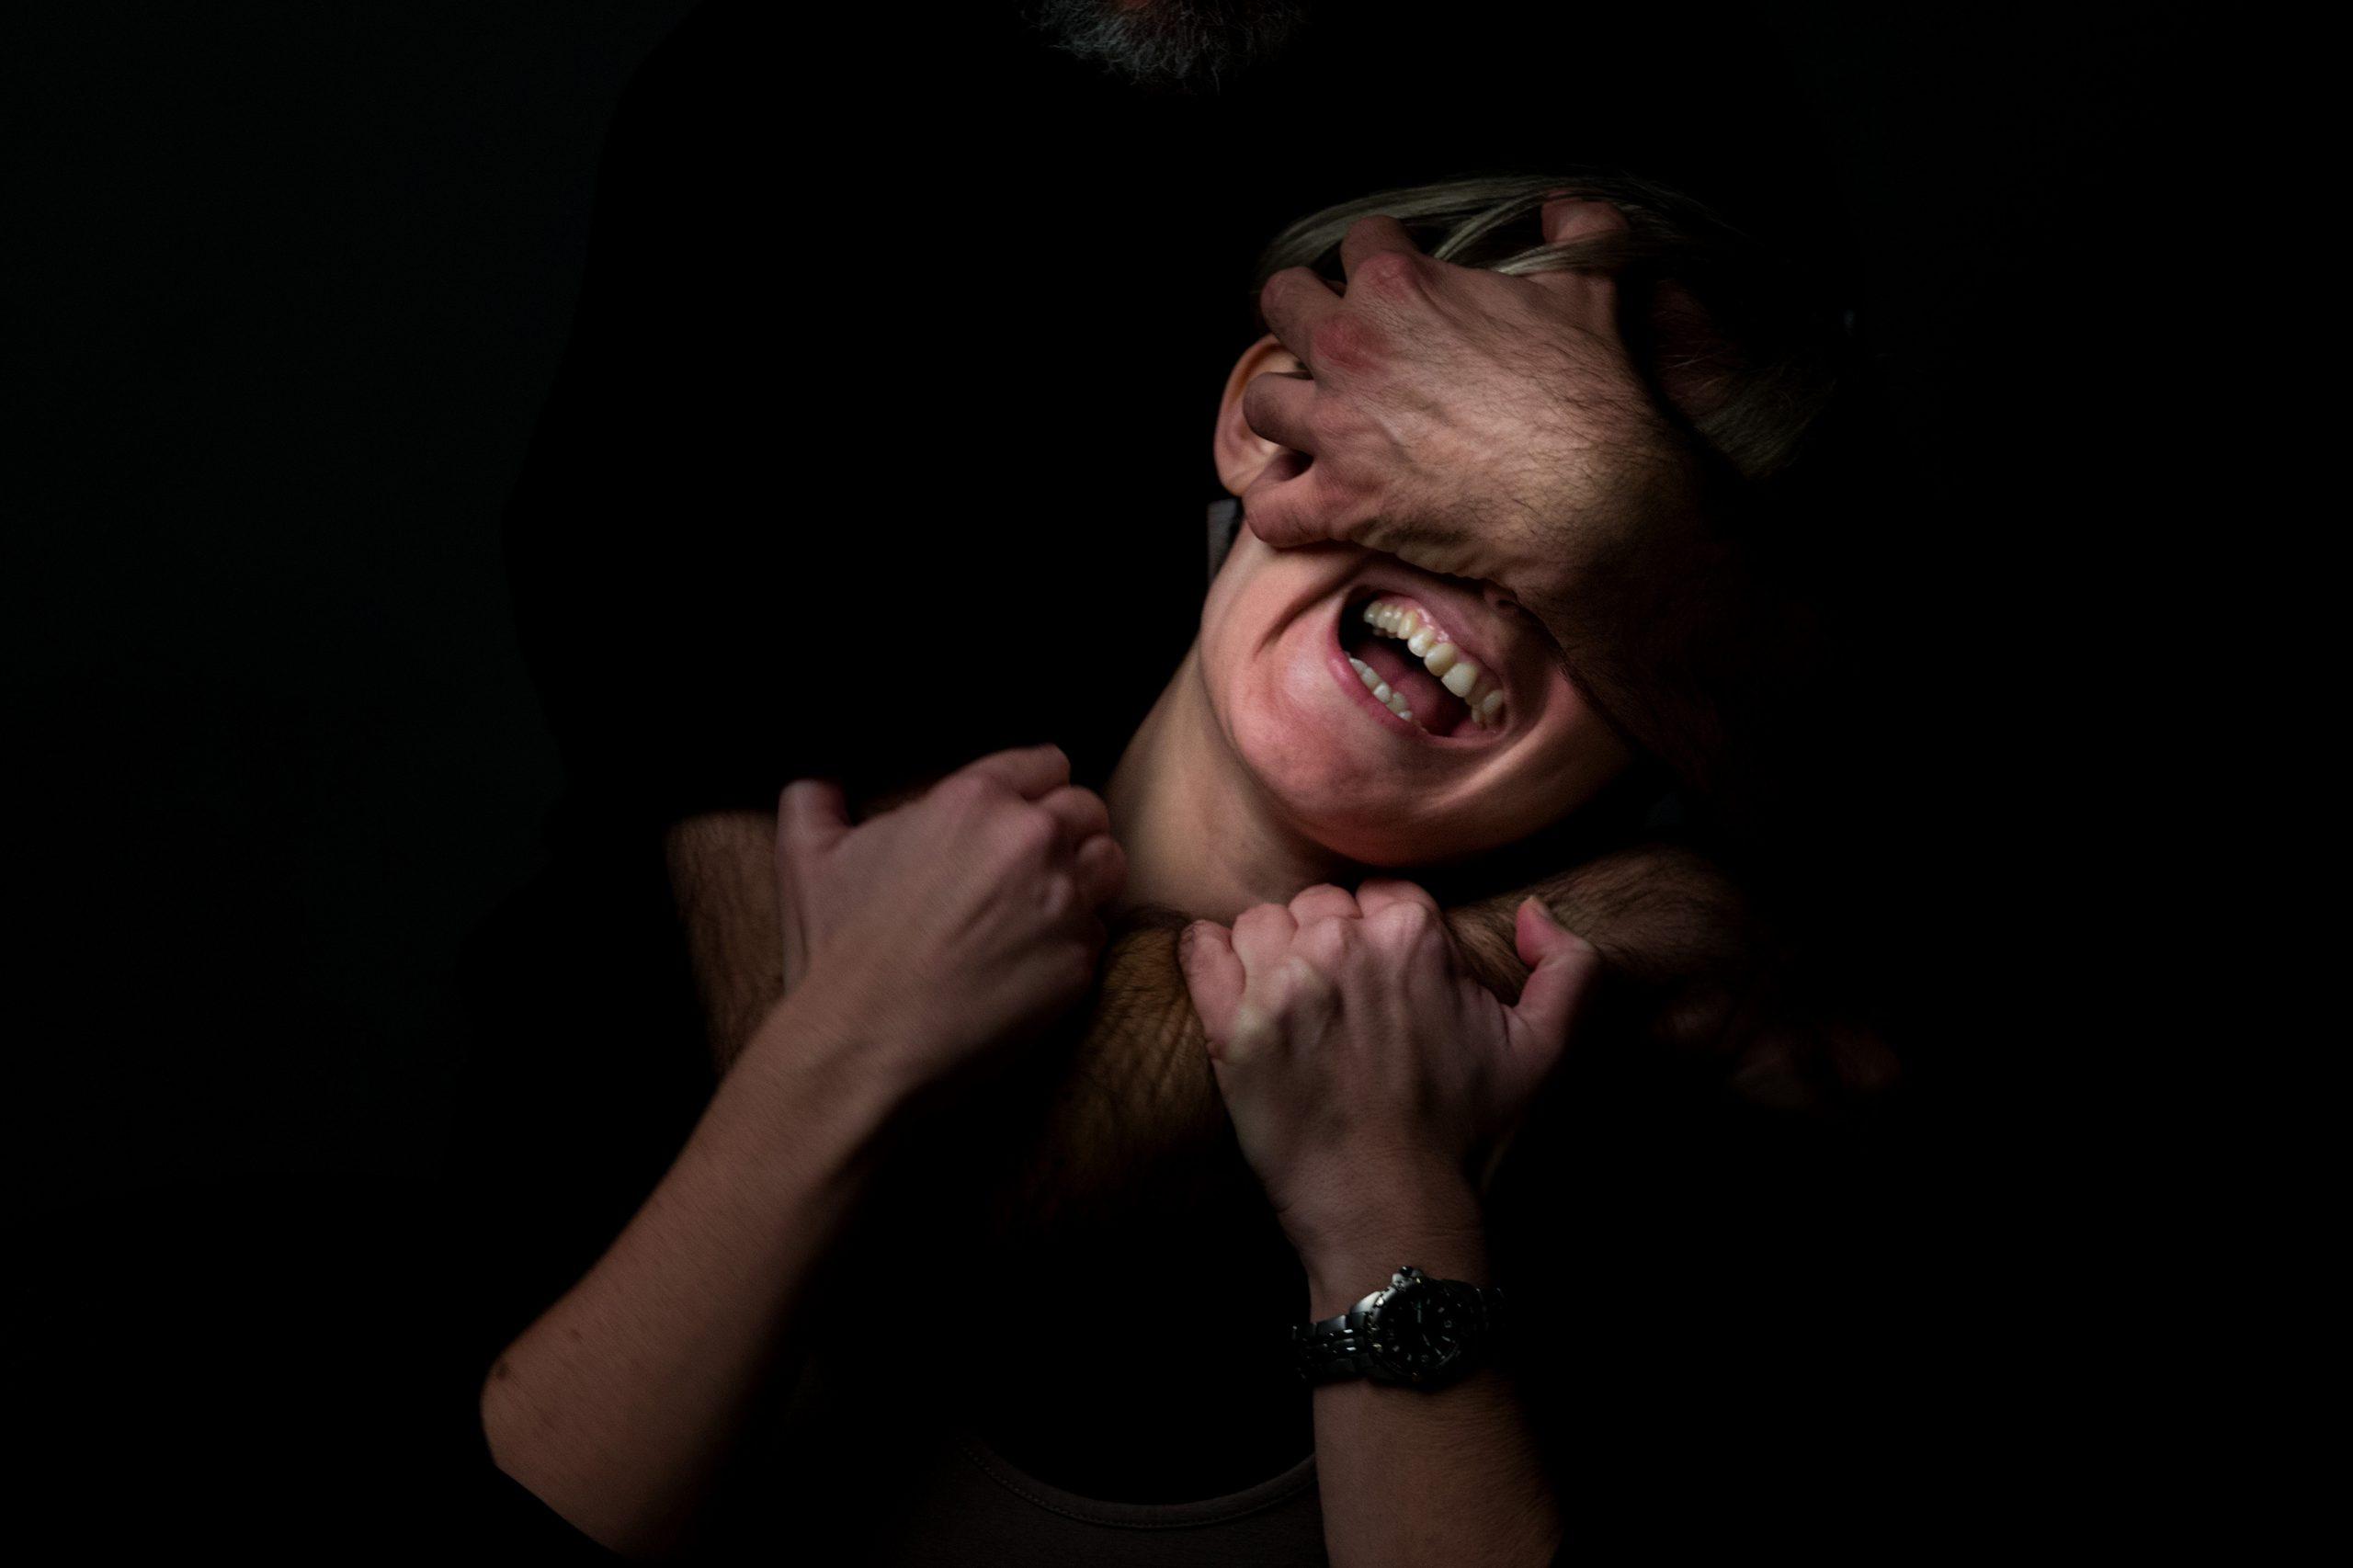 Ilustracija - nasilje / Foto Foto Davor Puklavec/PIXSELL